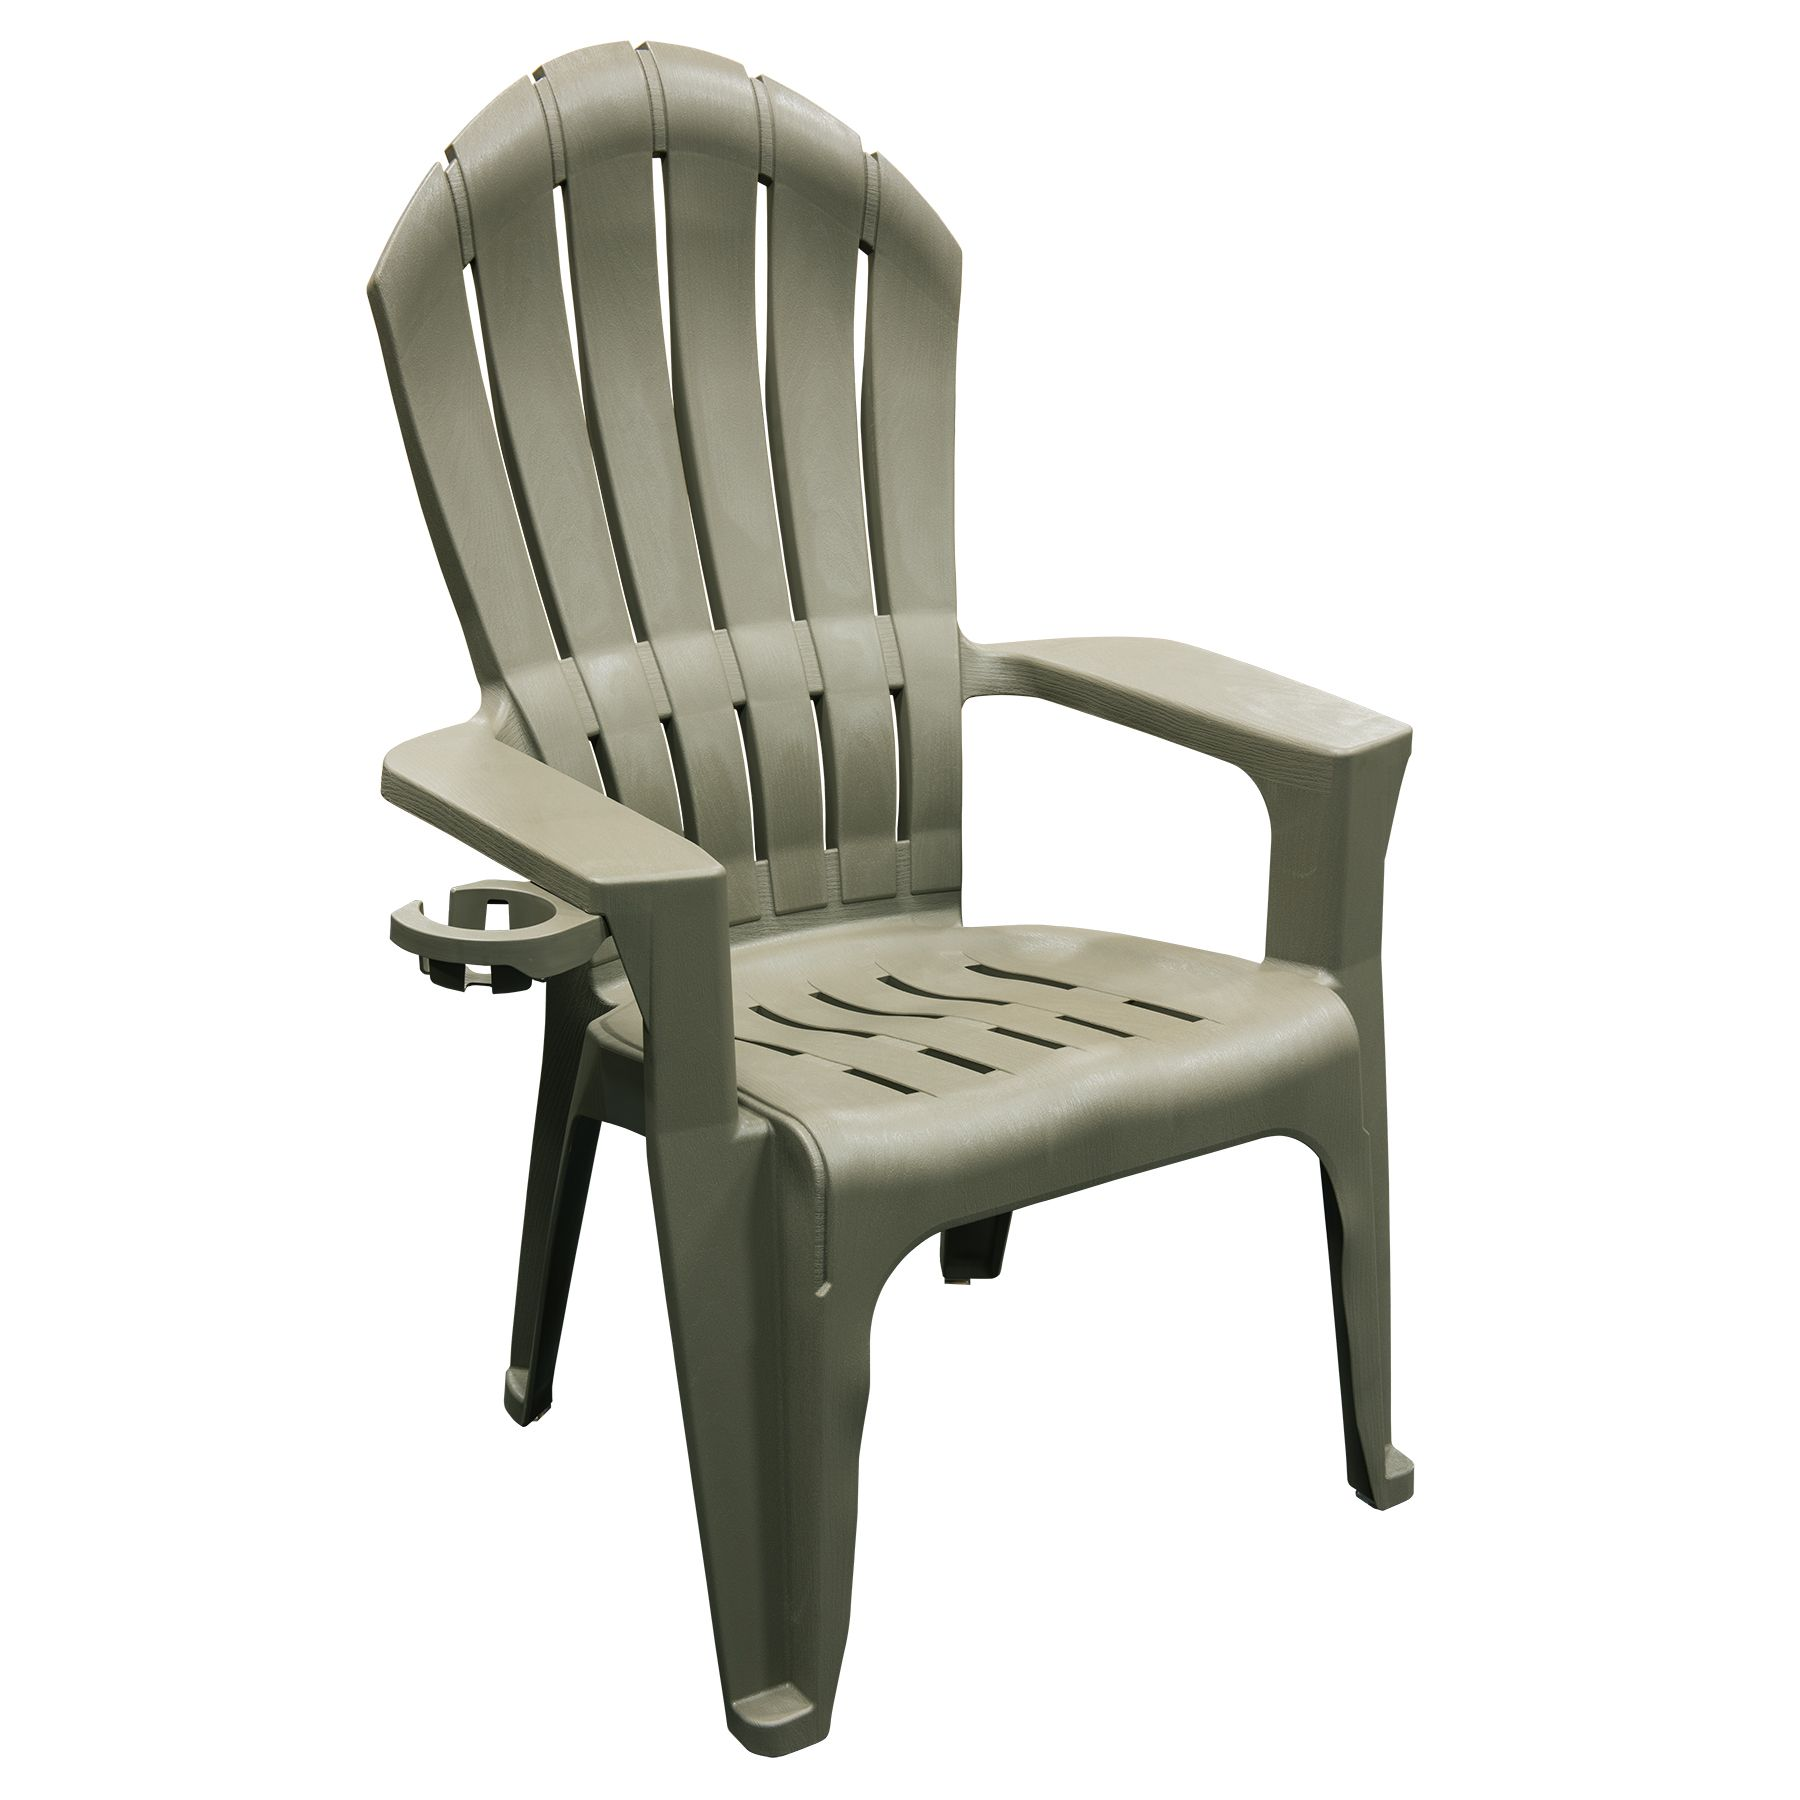 adams big easy adirondack chair on Adams Big Easy Outdoor Resin Adirondack Chair With Cup Holder Gray Walmart Com Resin Adirondack Chairs Adirondack Chair Wood Adirondack Chairs